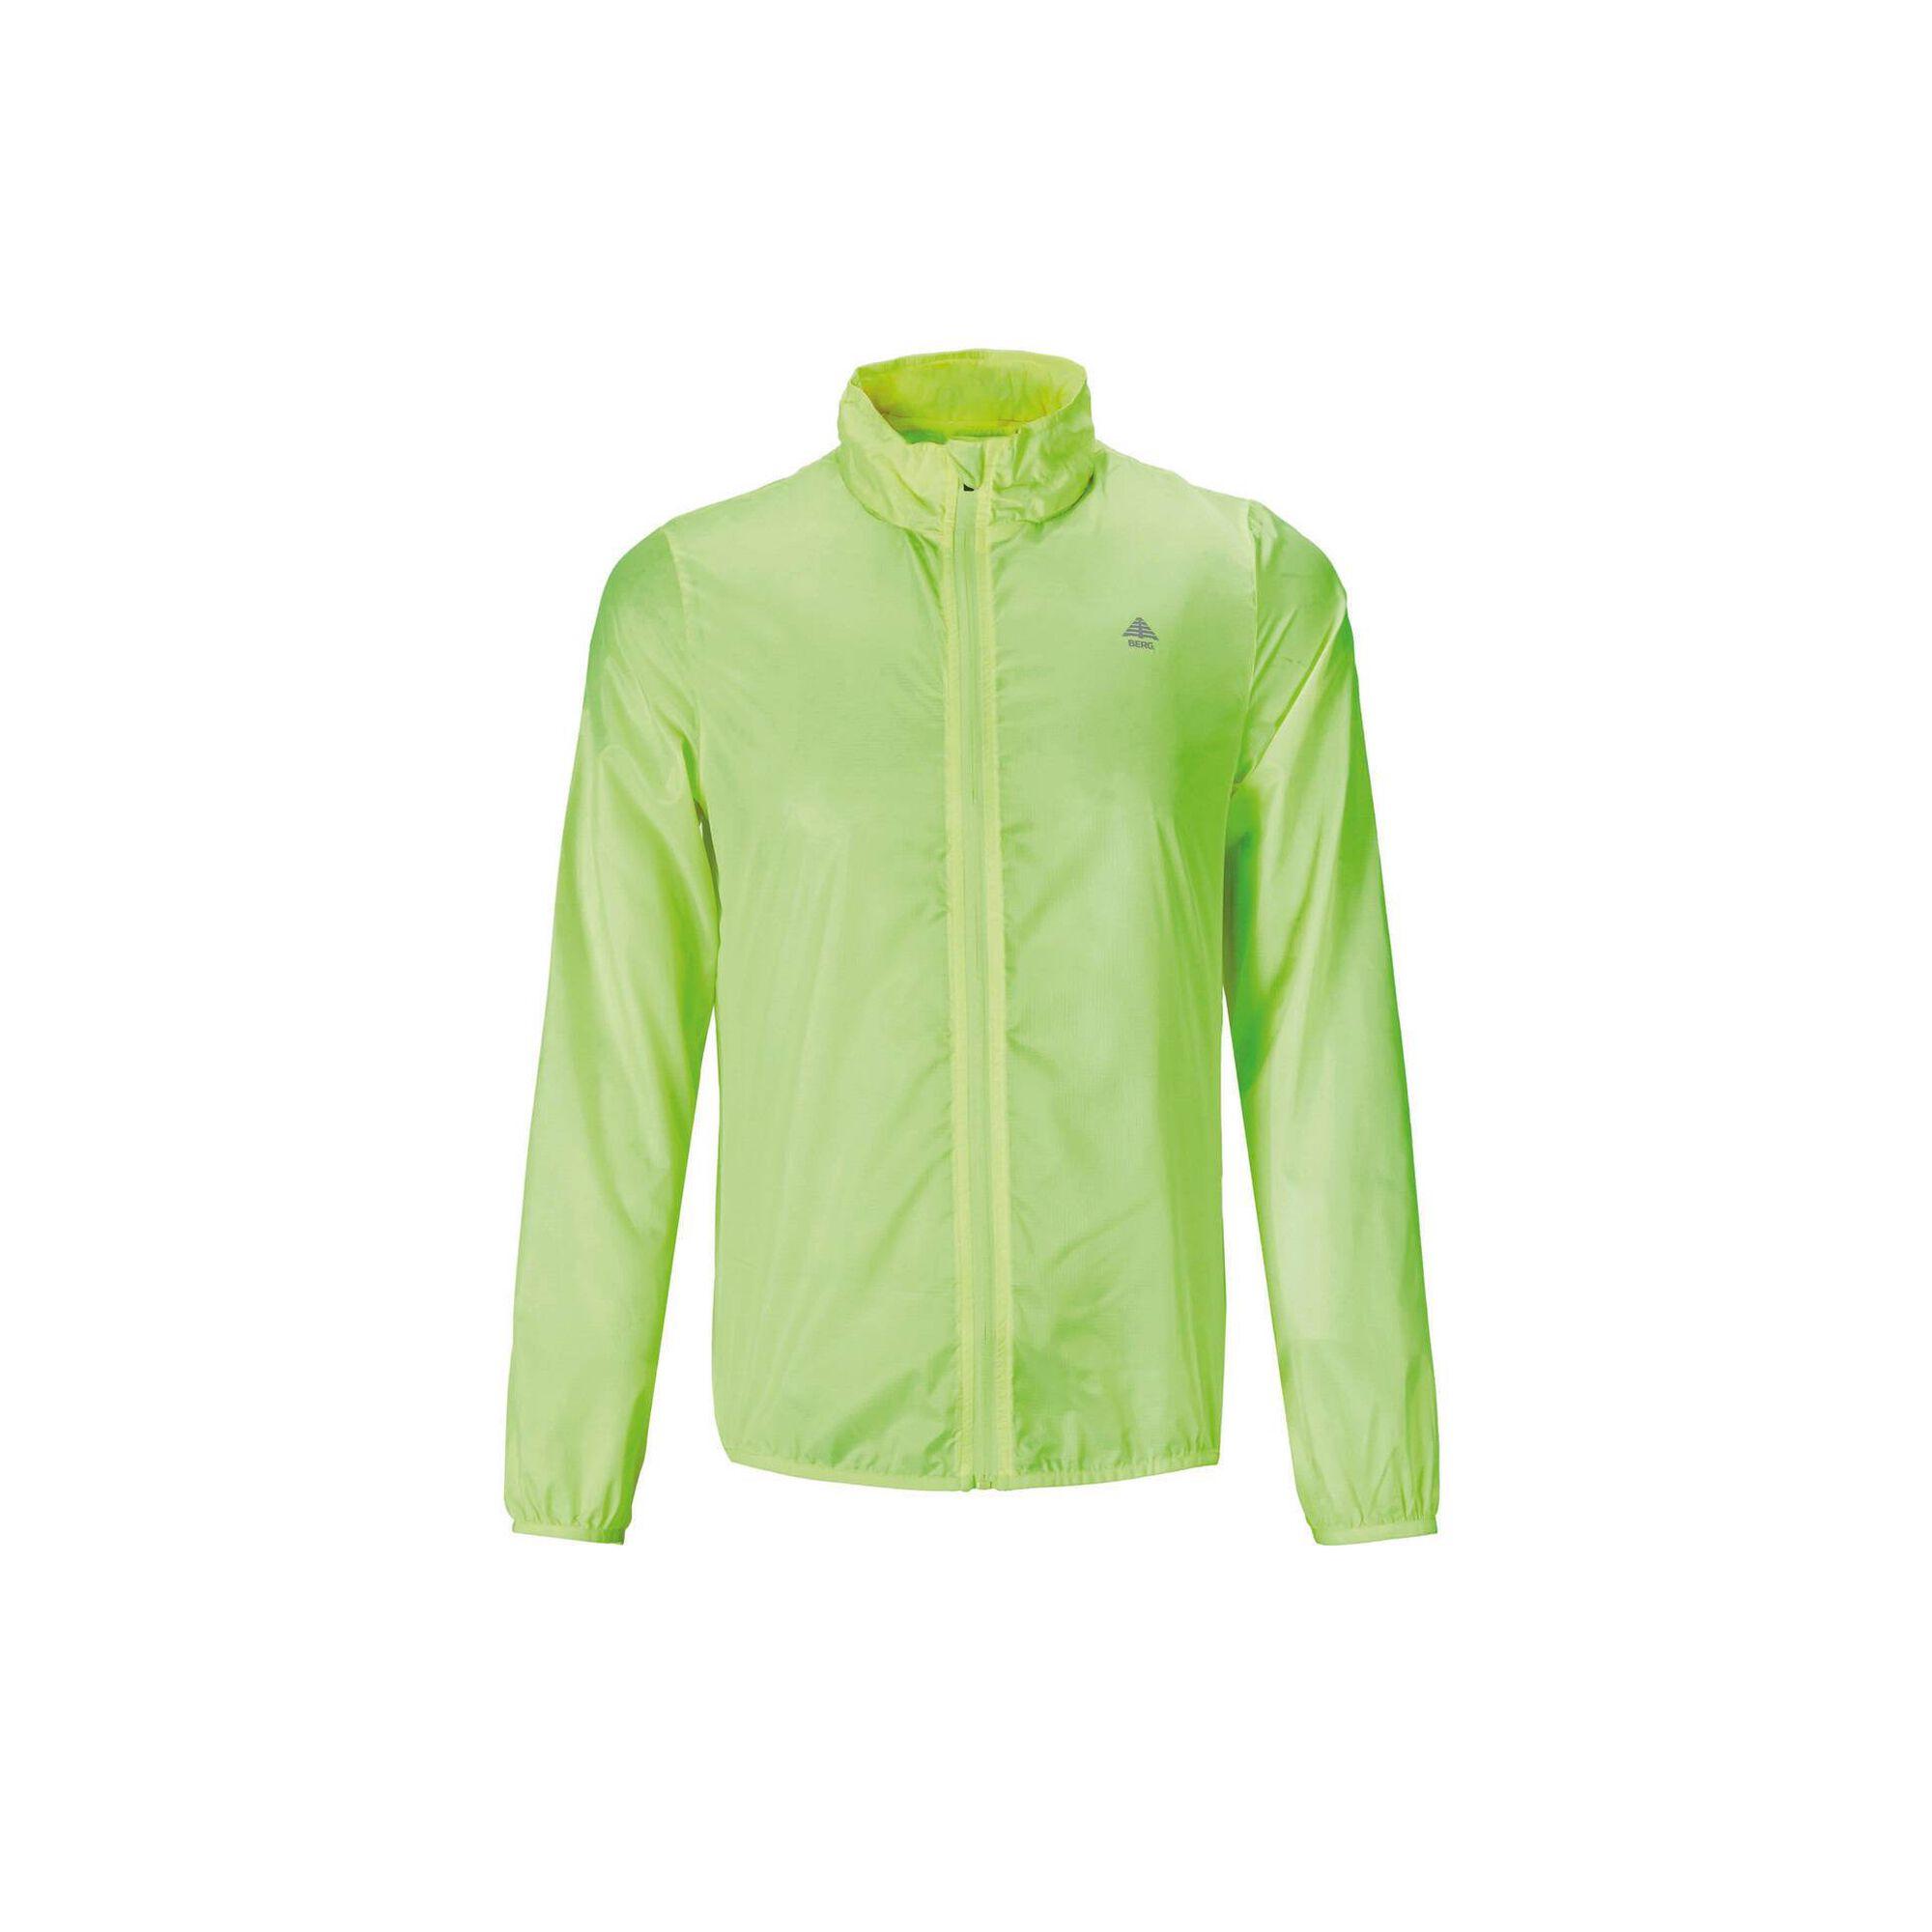 Casaco Corta-vento Homem Verde, Verde Fluorescente, hi-res